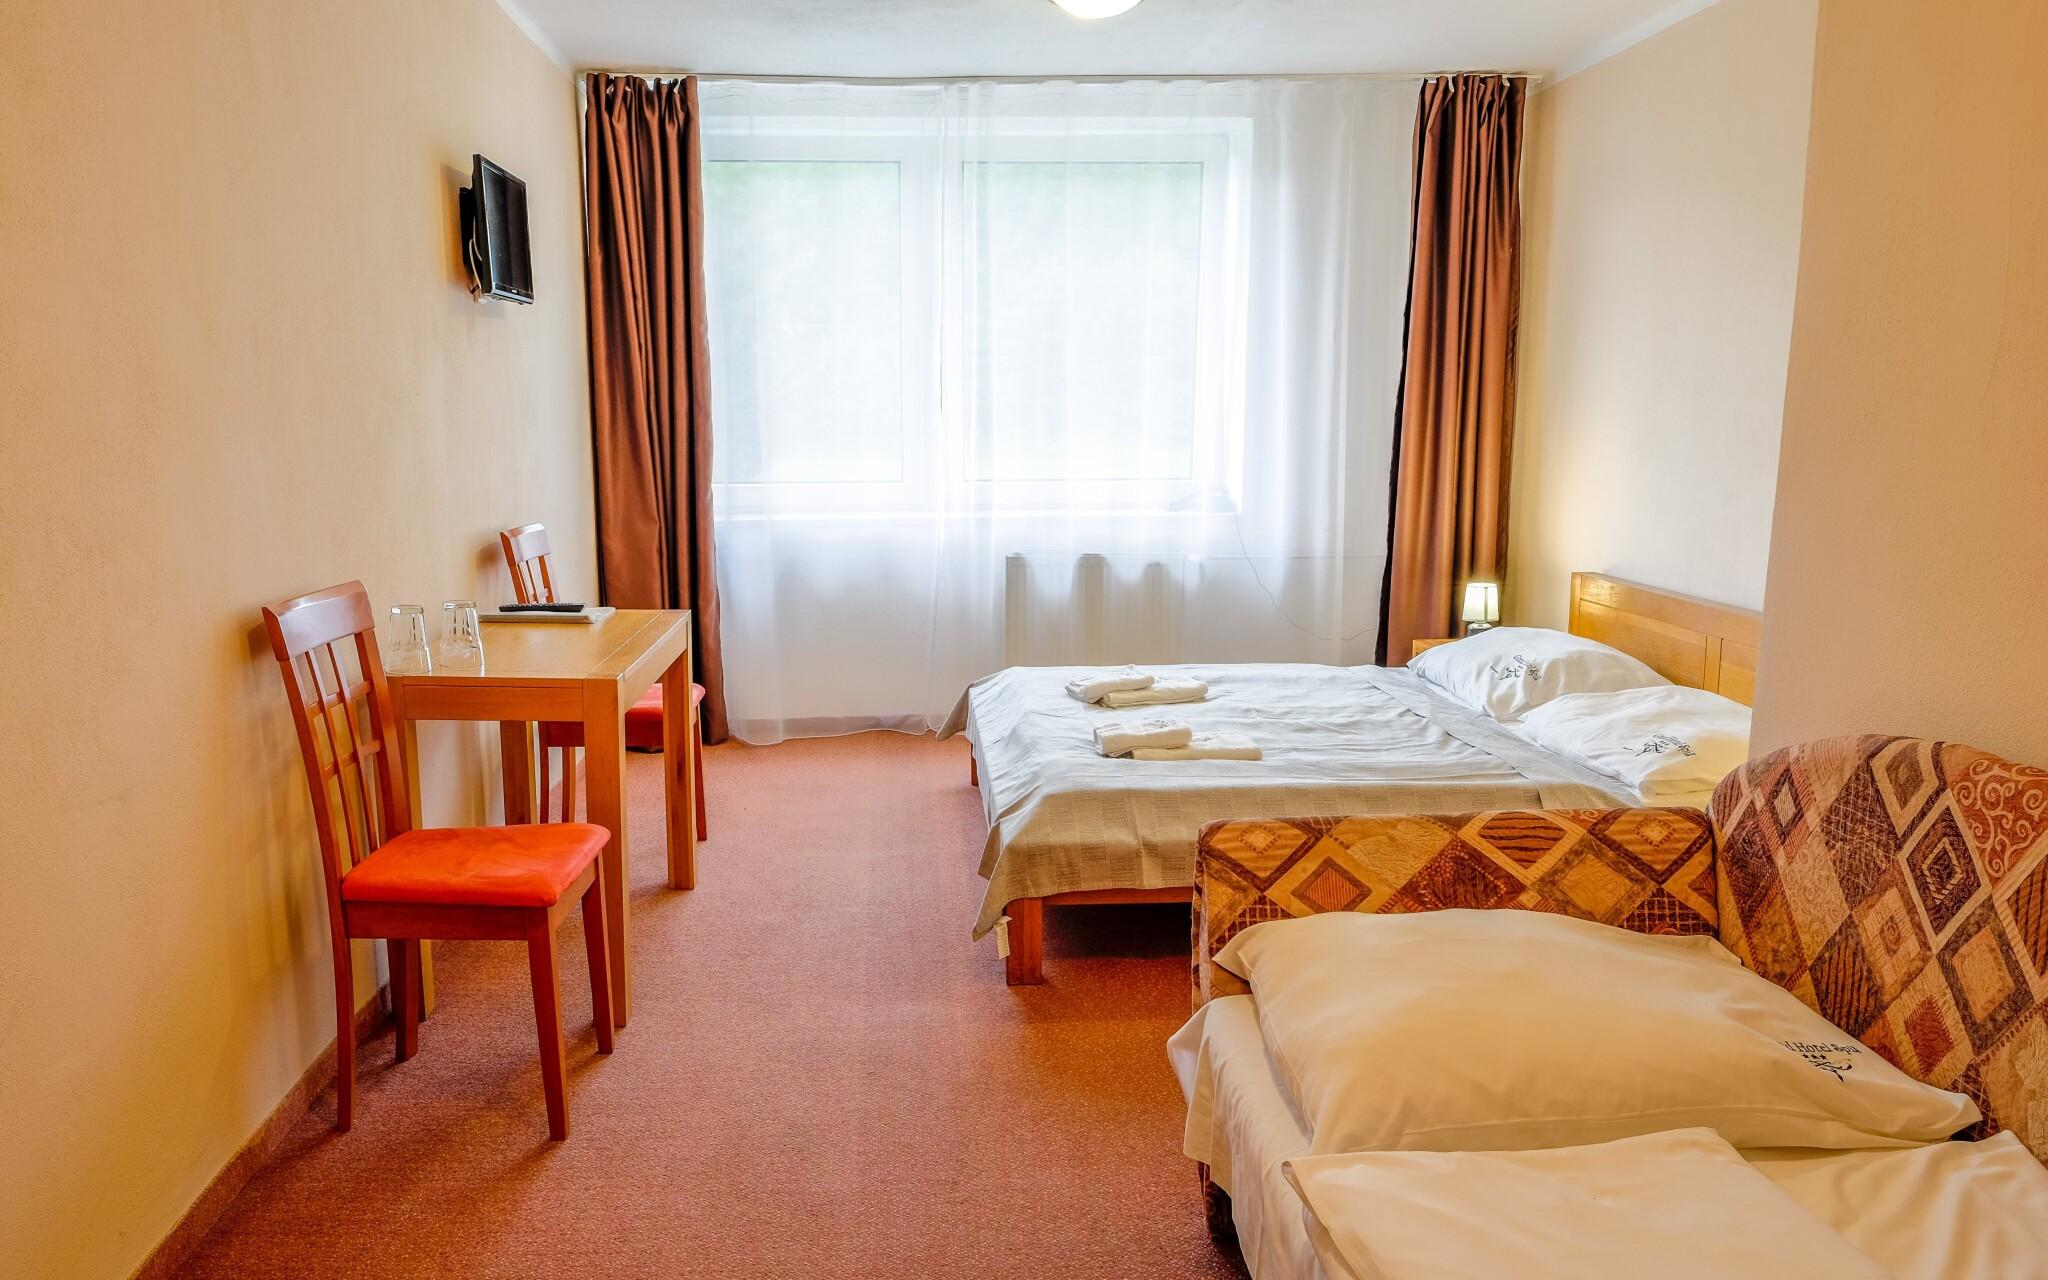 Ubytovanie v Grand Hoteli Spiš